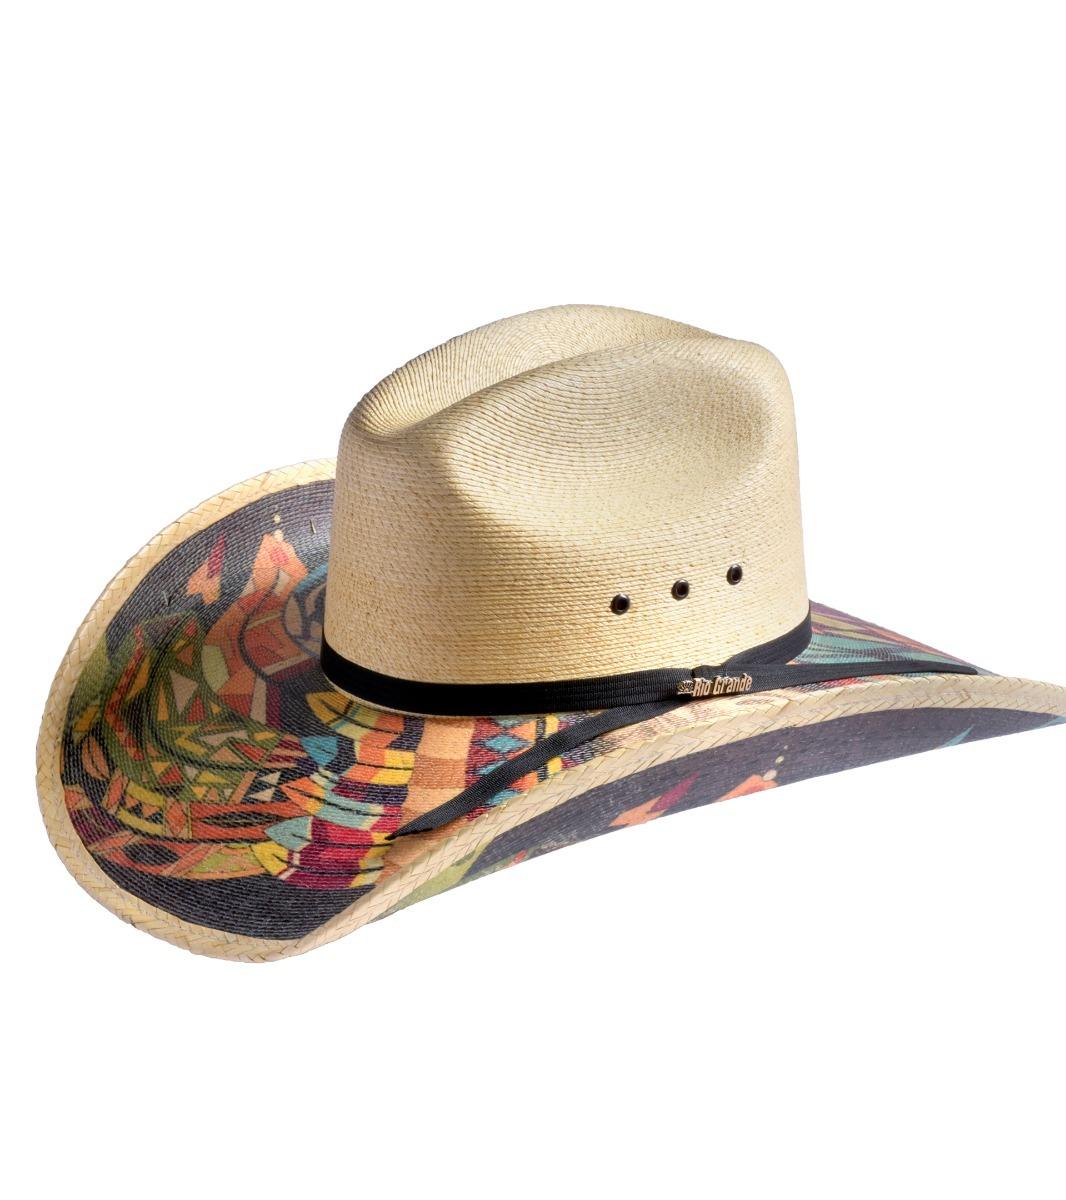 Sombrero vaquero de palma imagenesmy com jpg 1066x1200 Palma sombreros  vaqueros para hombre 38785f91ce9